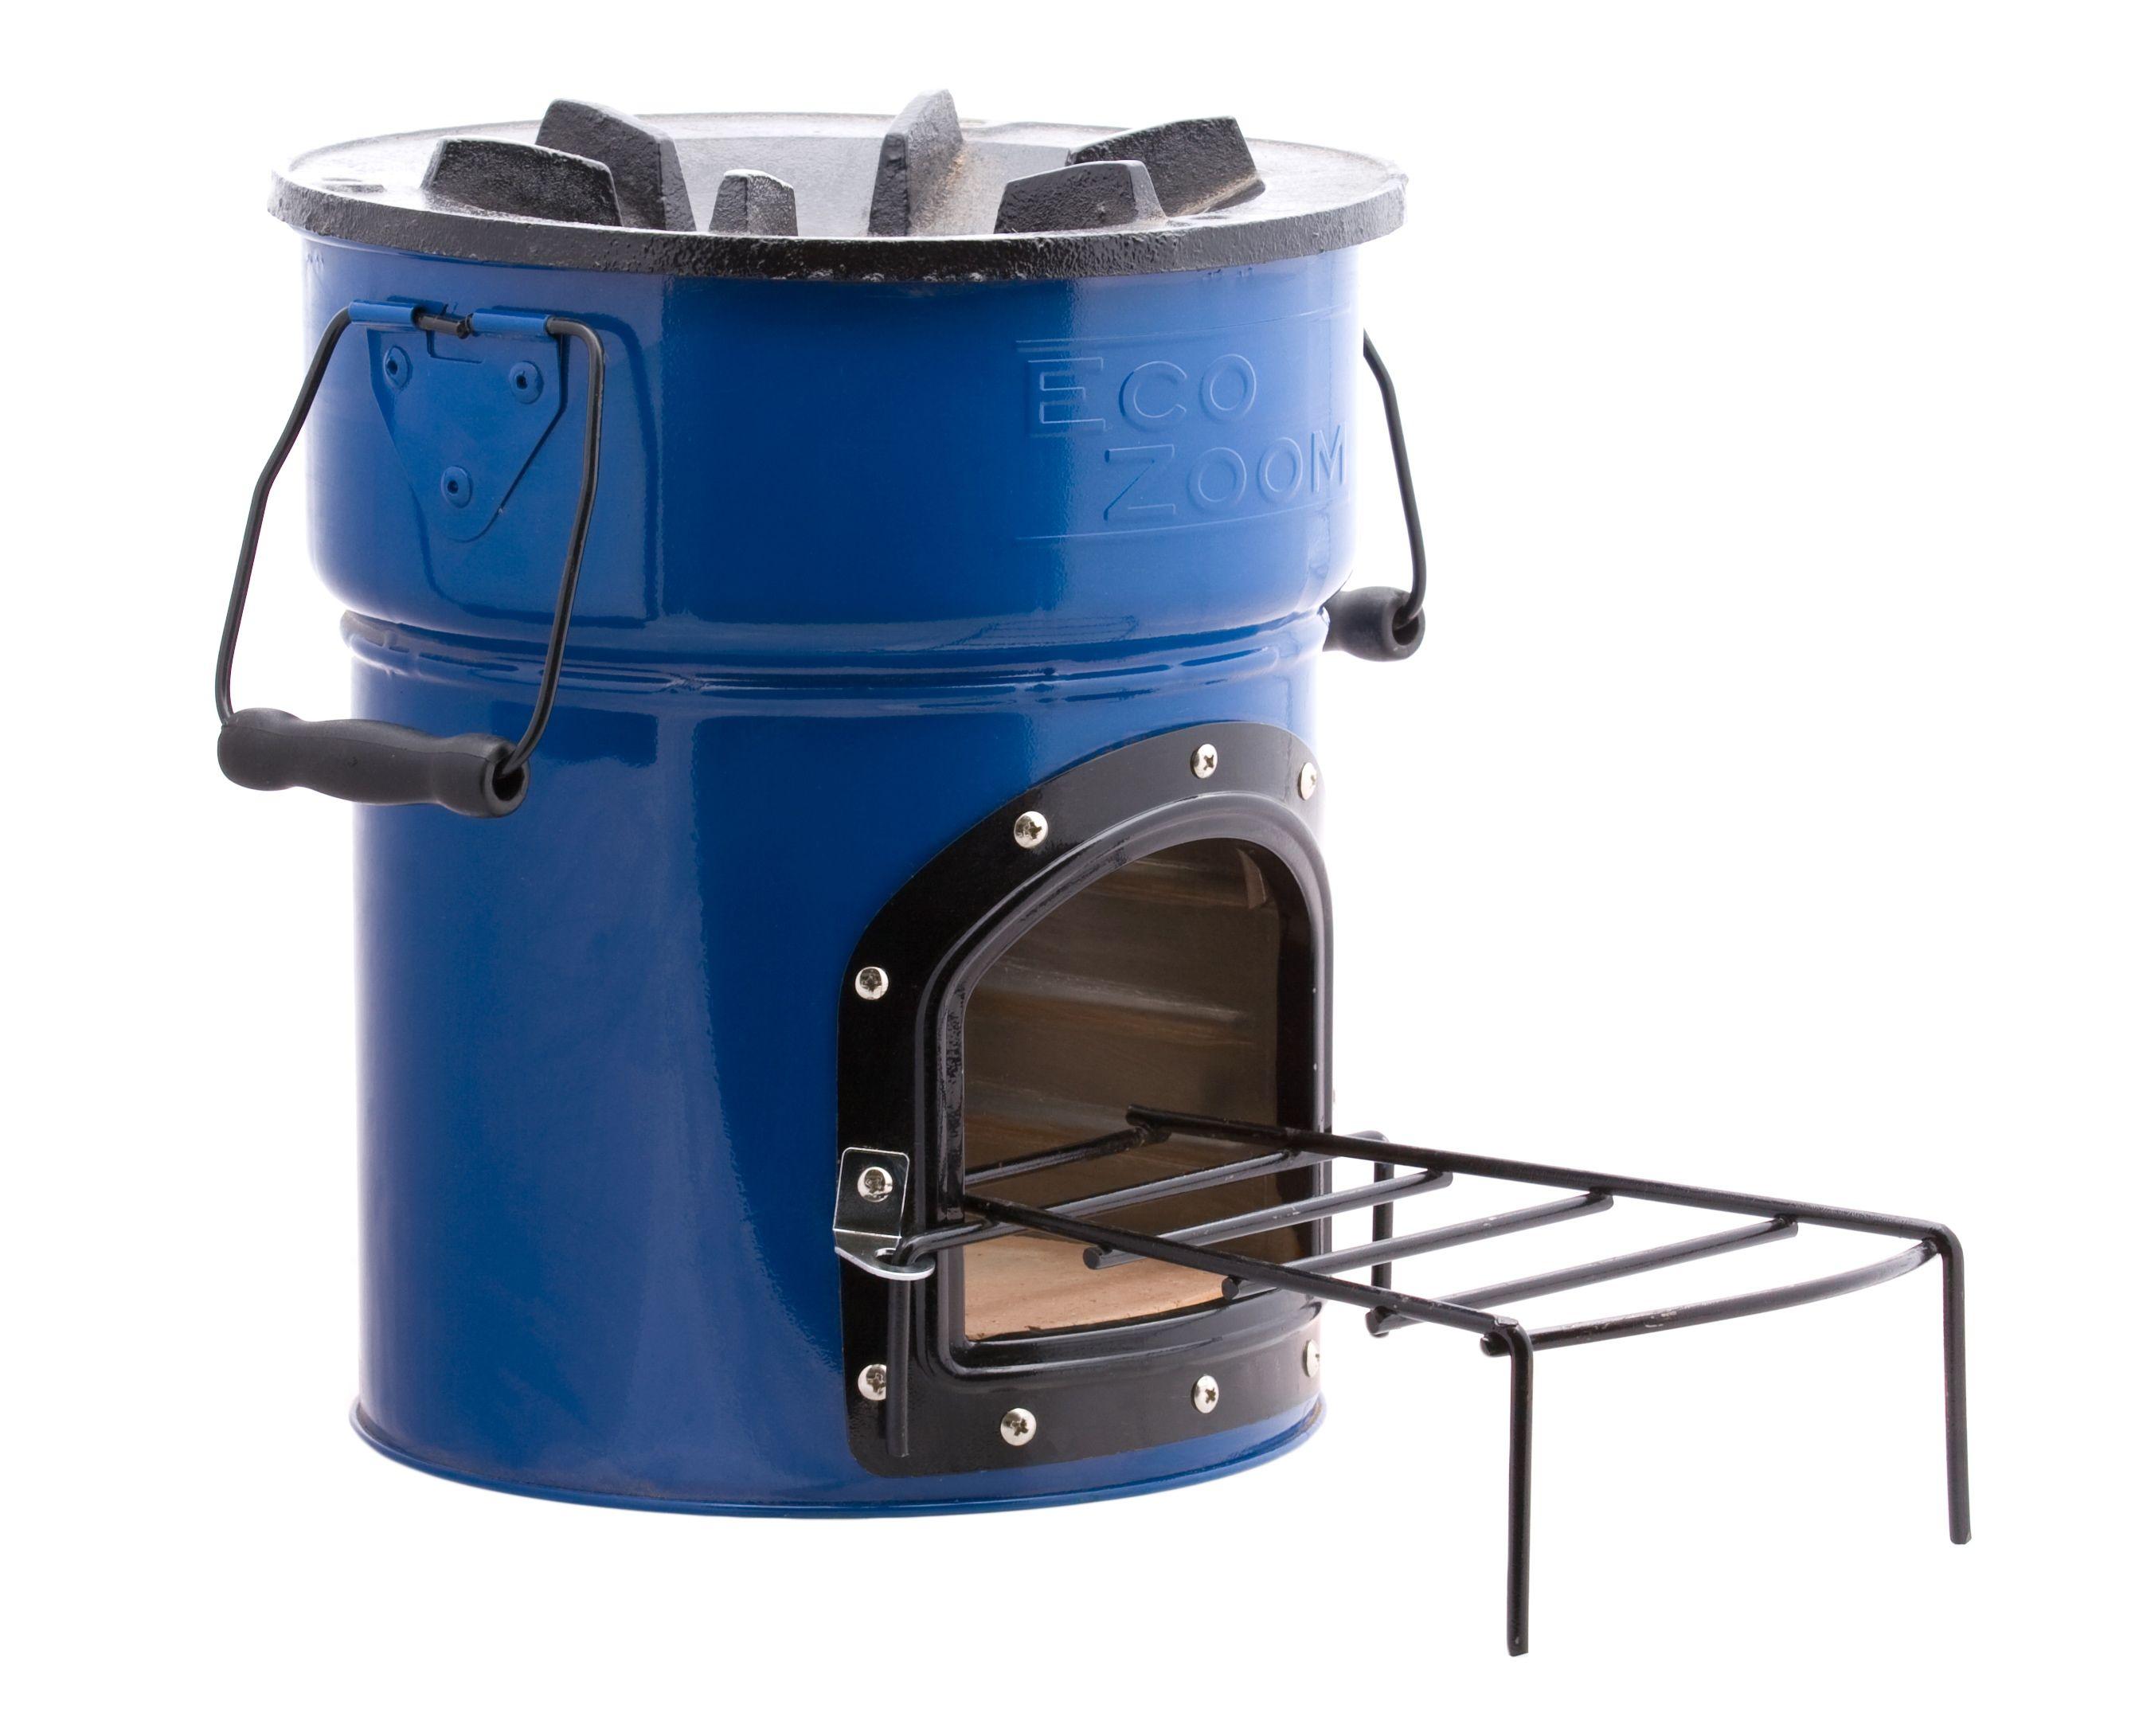 cute little camp stove